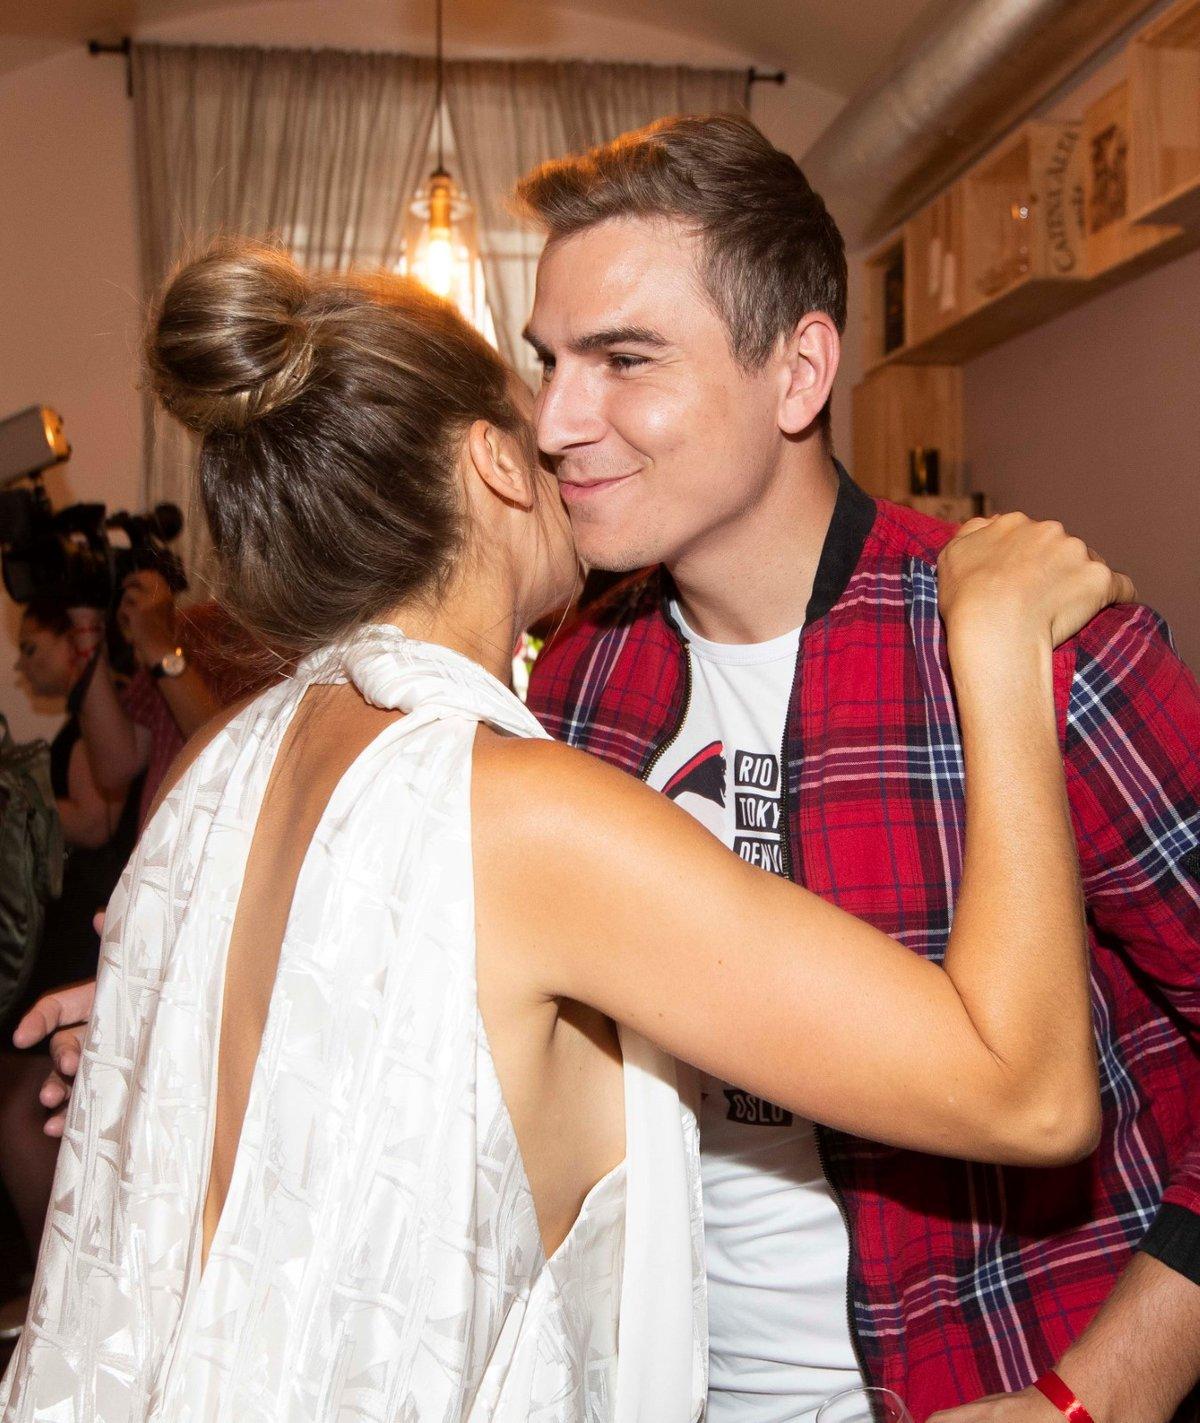 Lucie Vondráčková a David Gránský křtí videoklip Růže